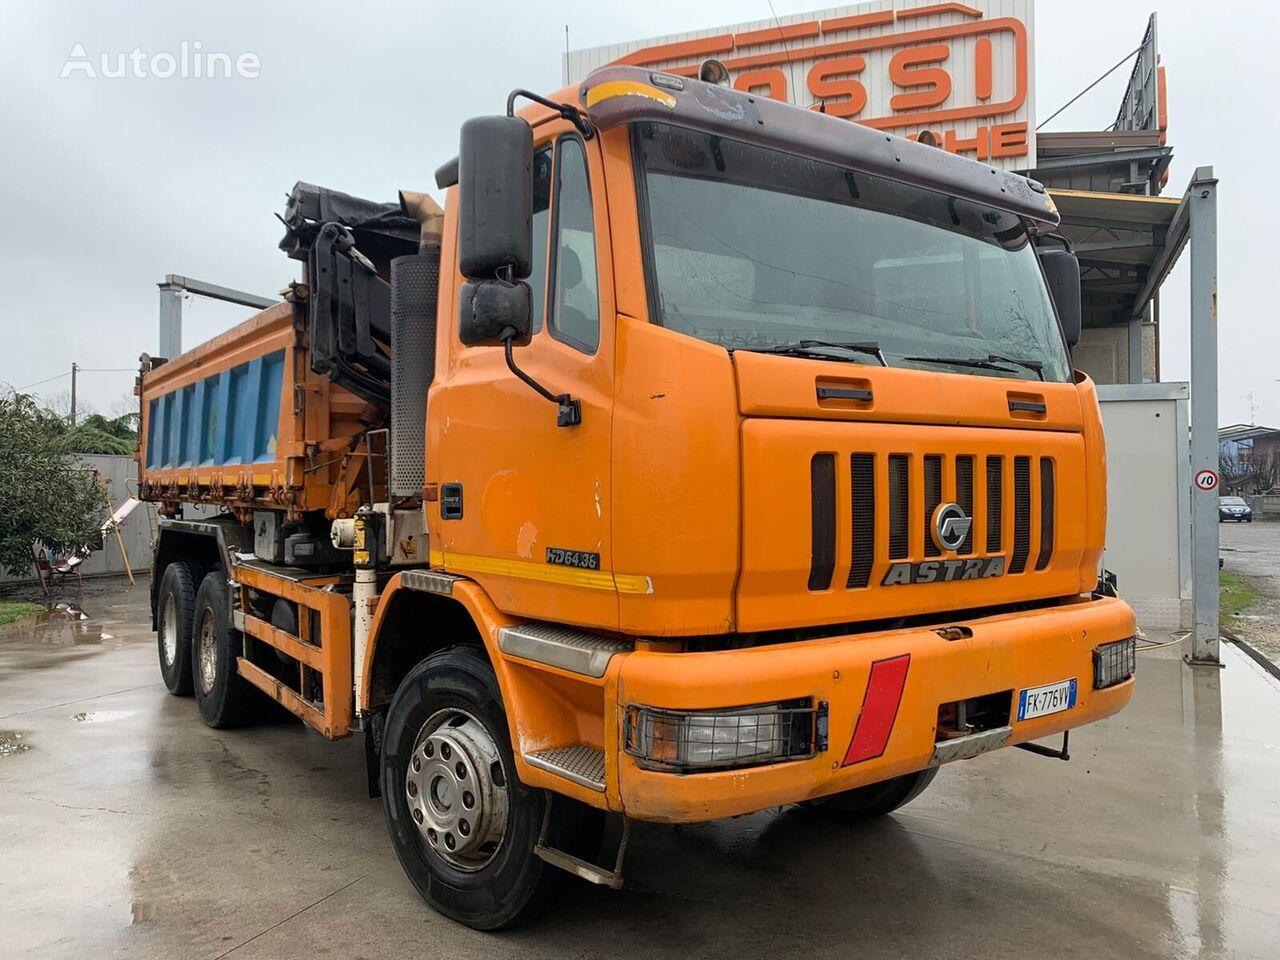 ASTRA HD7 64 38 dump truck